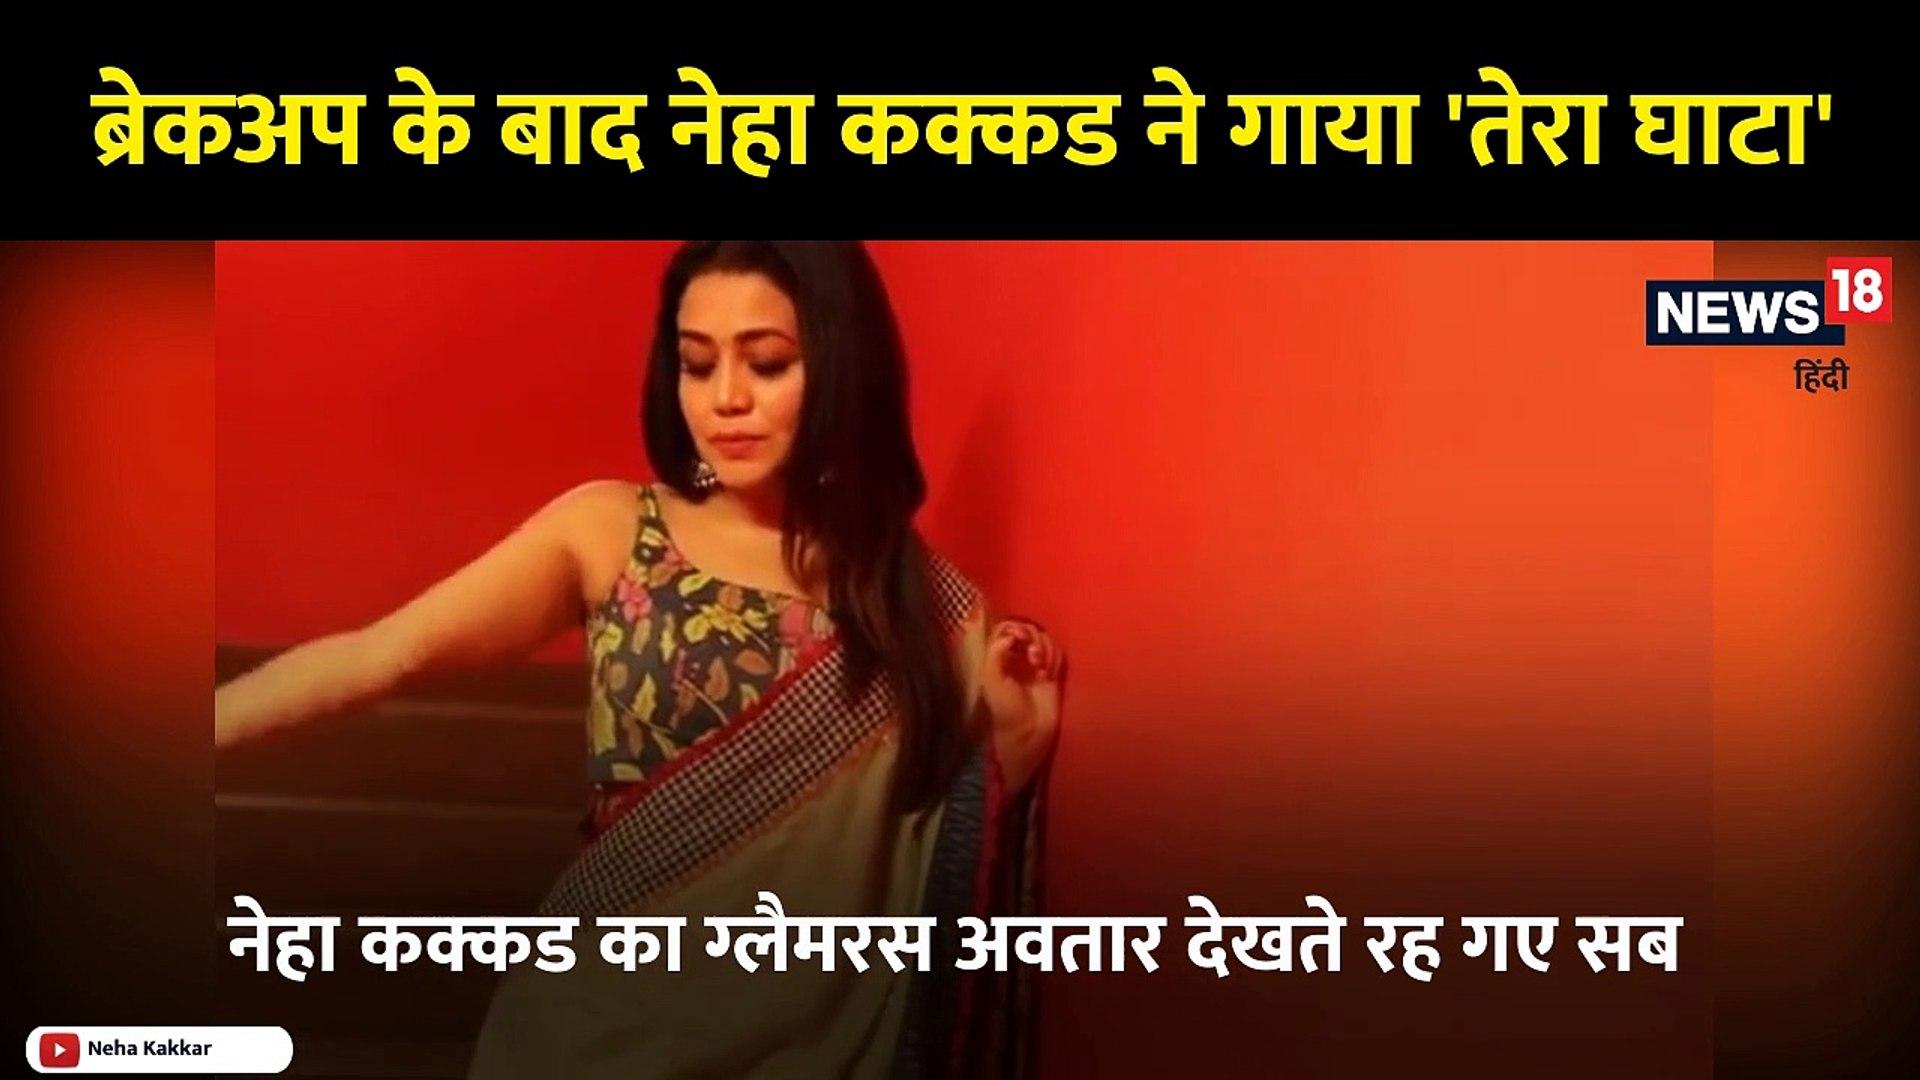 Neha Kakkar Isme Tera Ghata Video Video Dailymotion